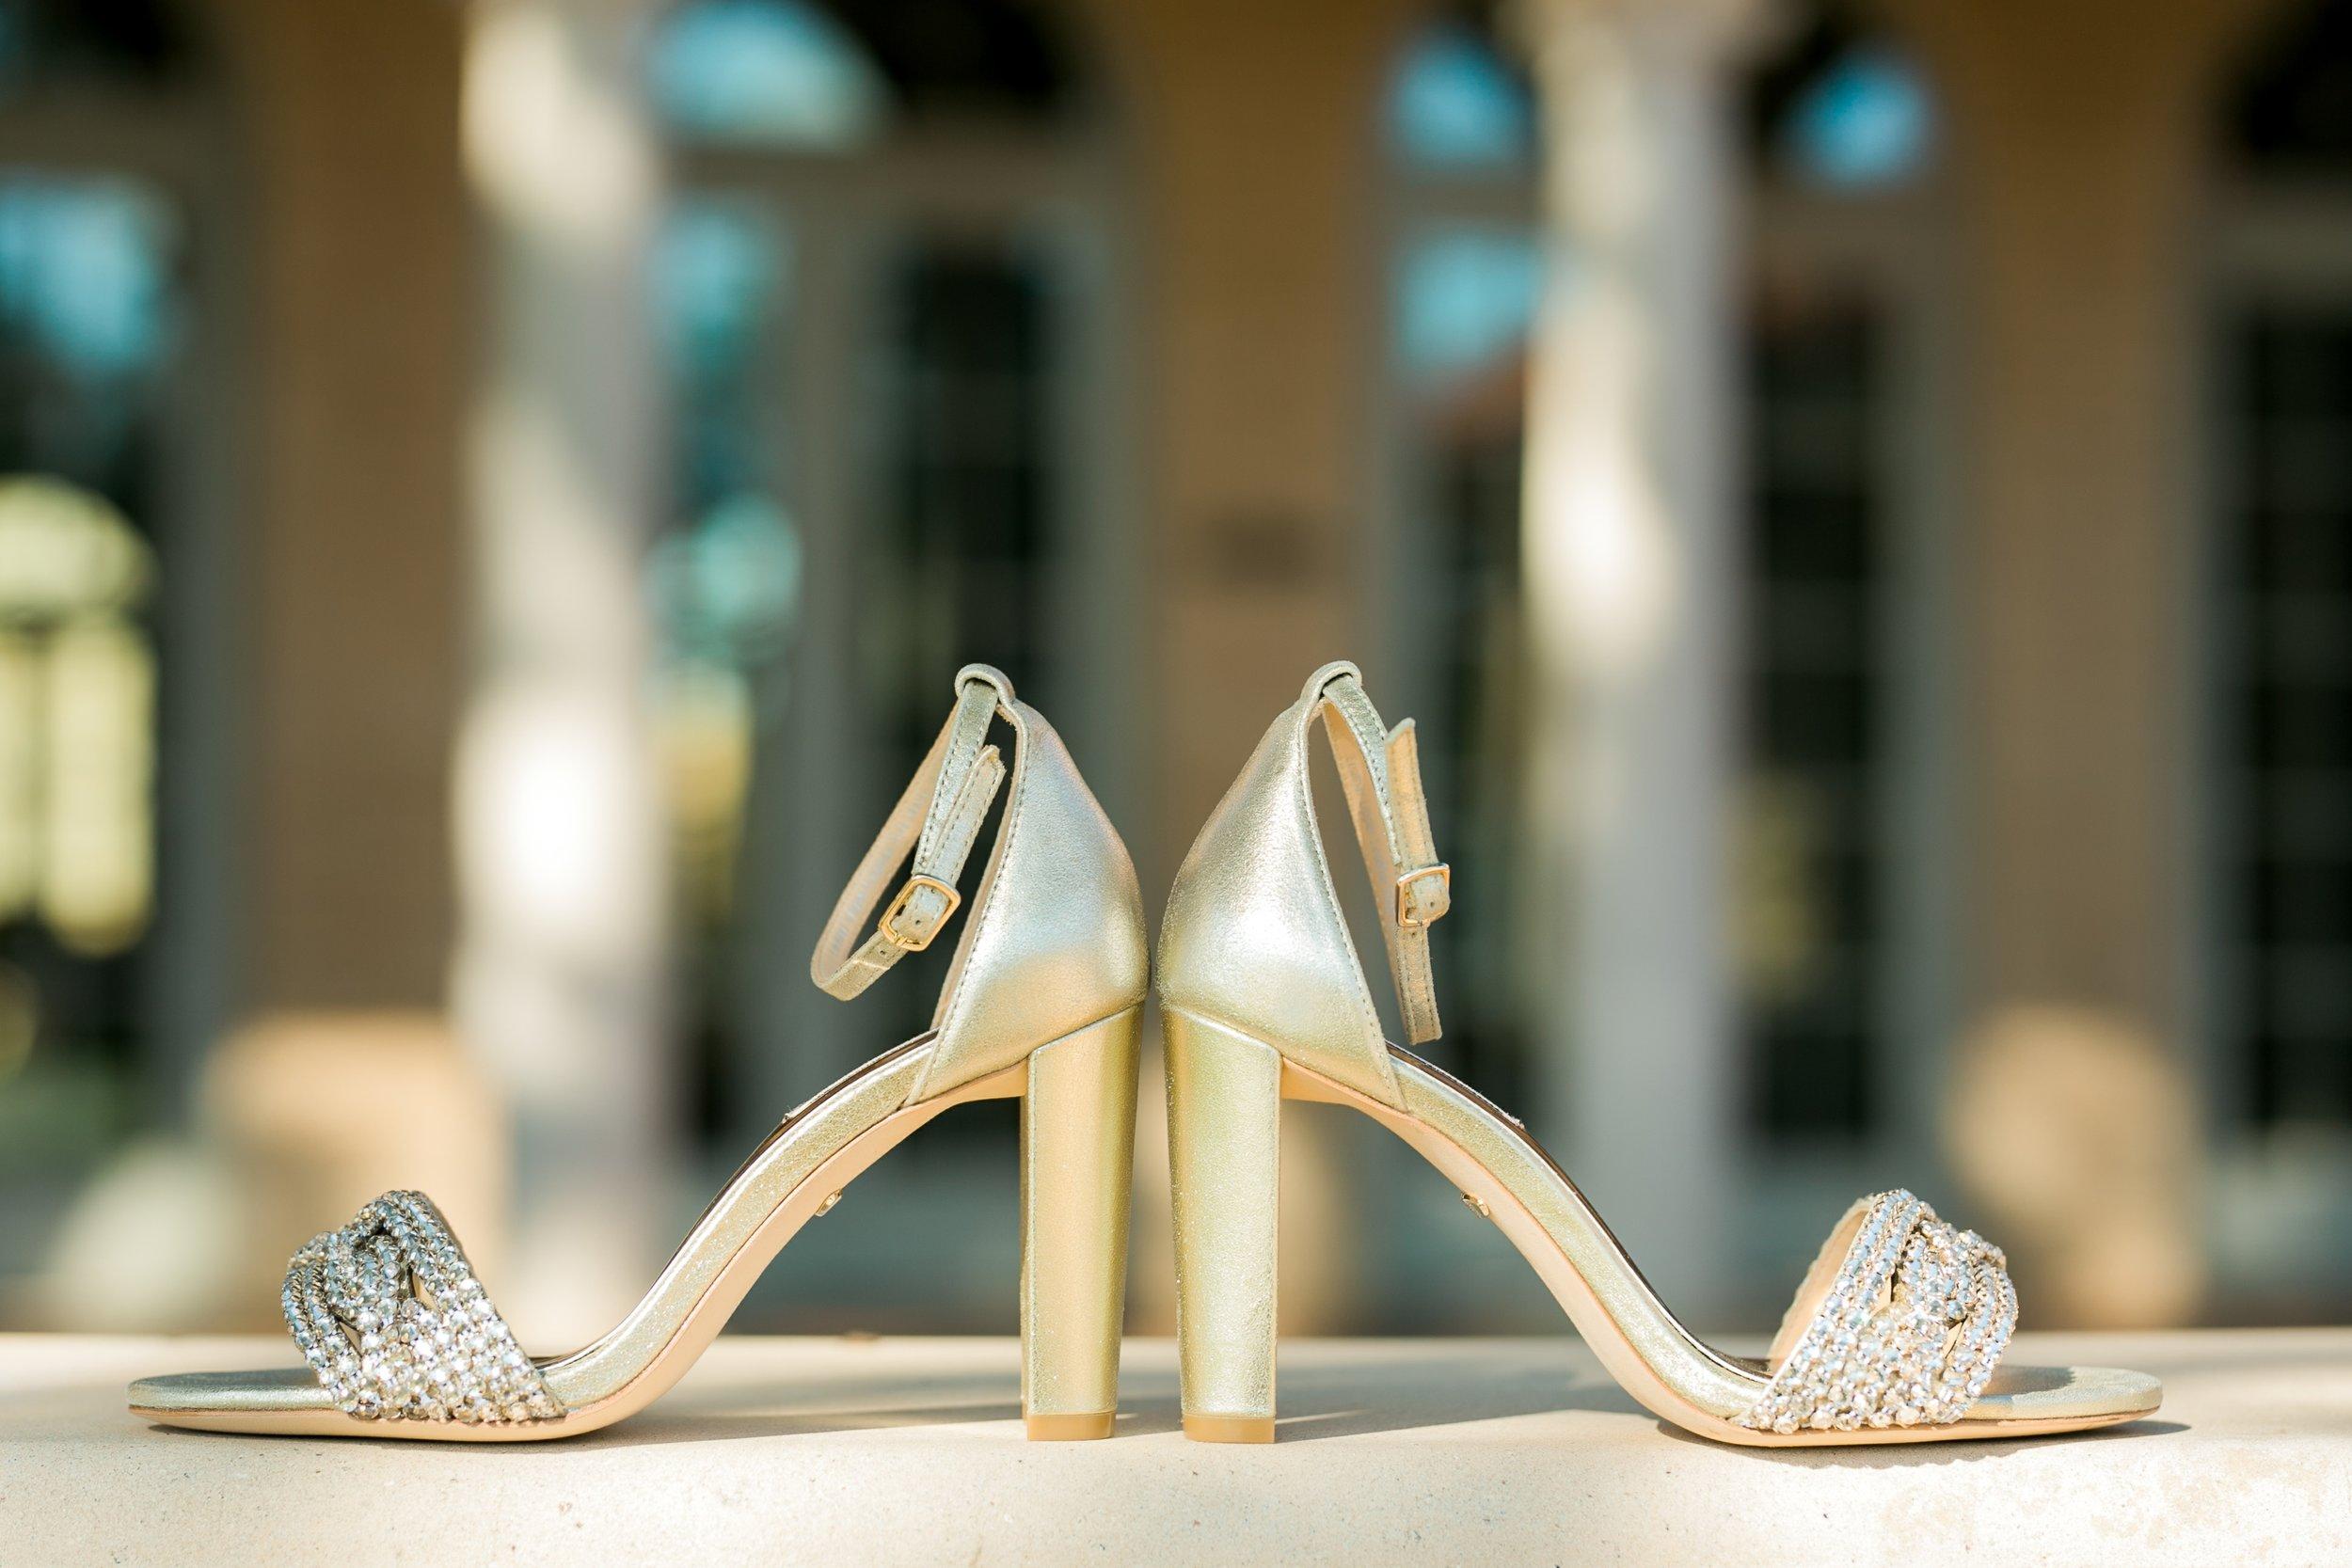 Roberson-Wedding-The-Forum-Lauren-Pinson-Wedding-Photography-Wichita-Falls-Texas-007.jpg